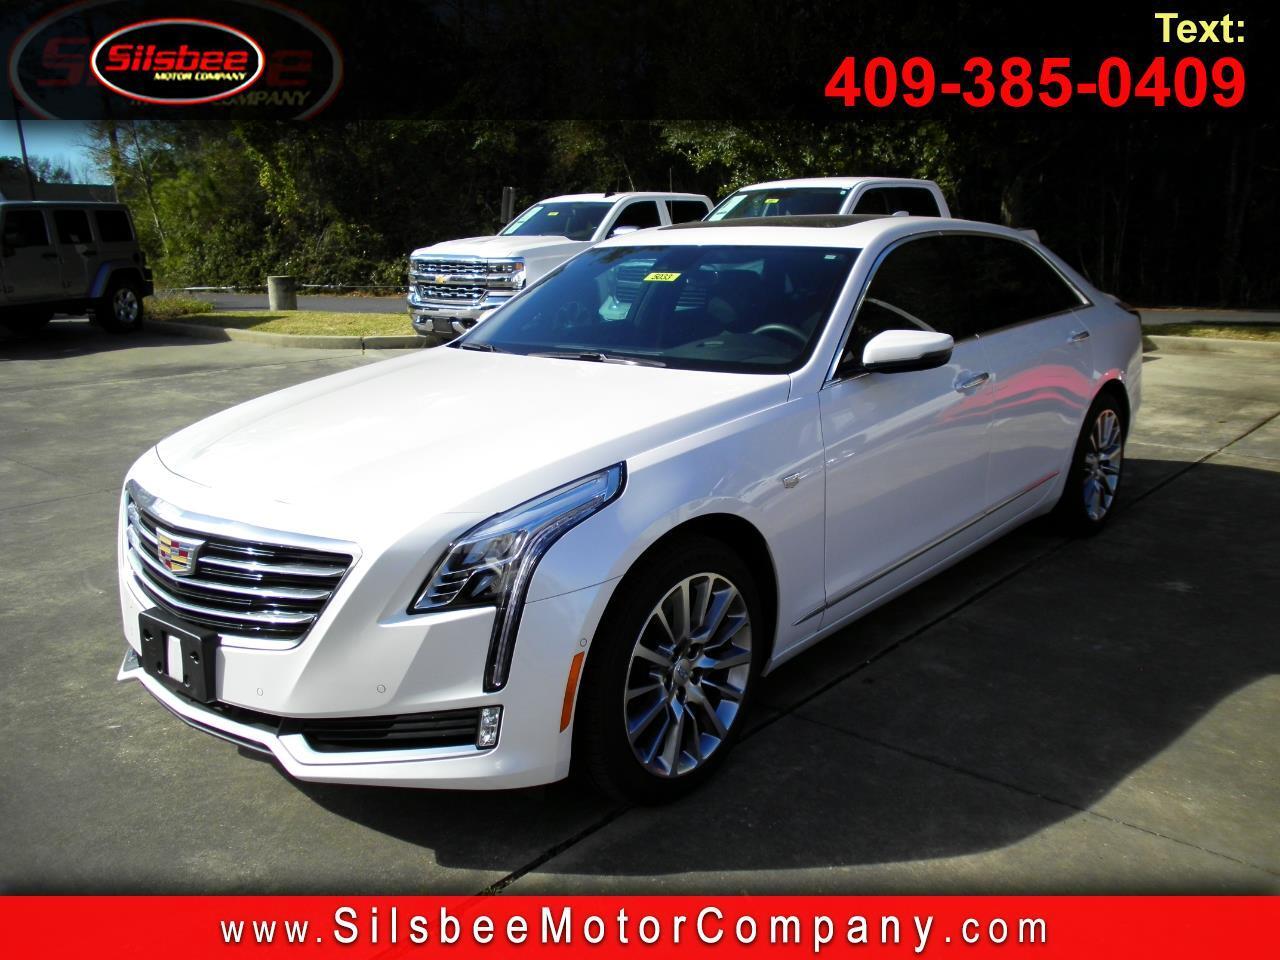 2017 Cadillac CT6 Sedan 4dr Sdn 3.6L Luxury AWD